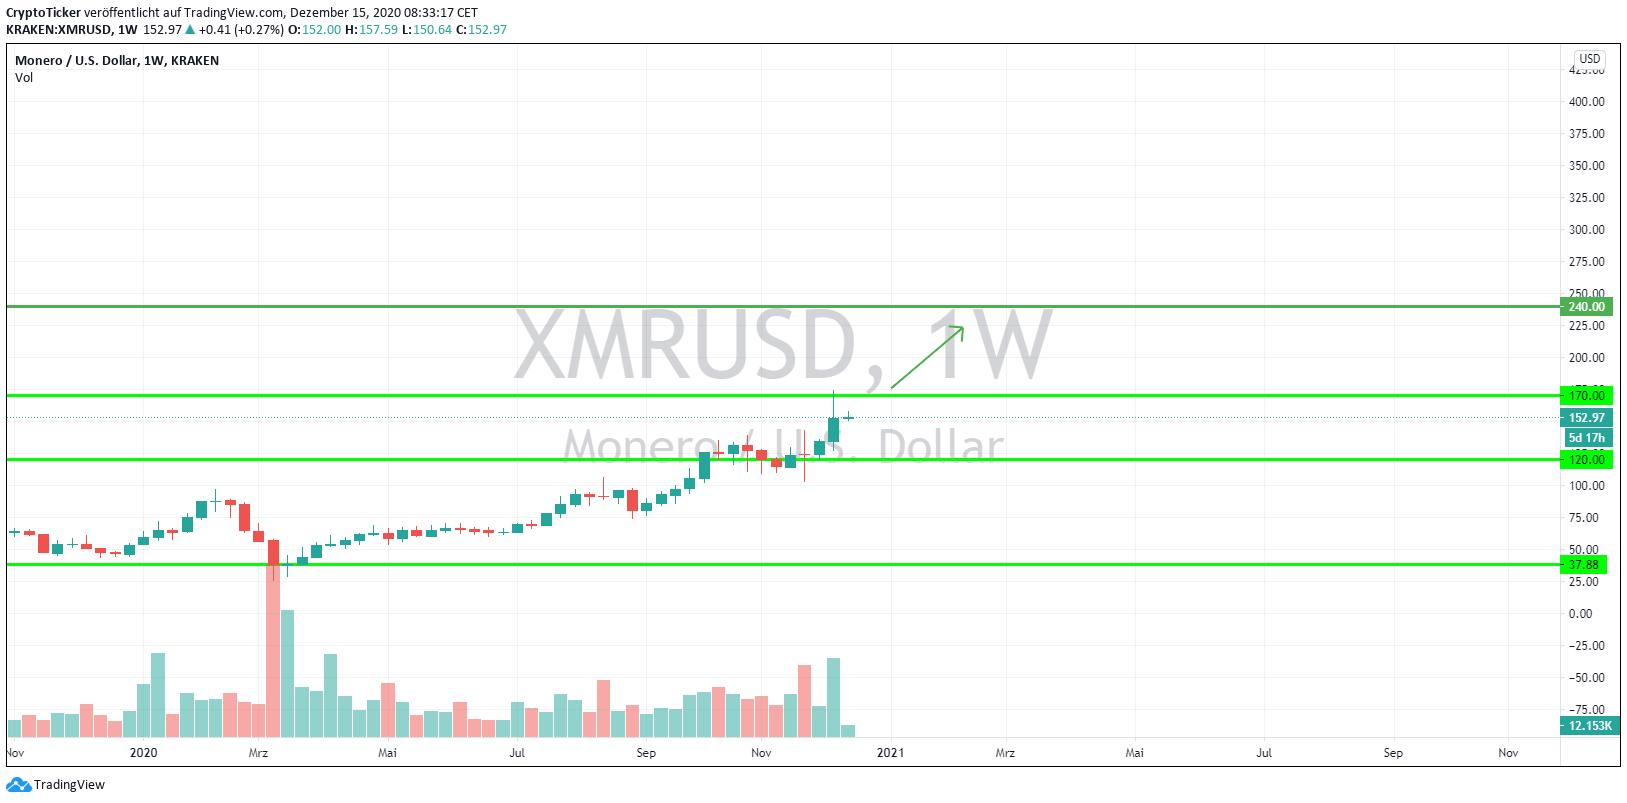 XMR/USD 1-Week chart, showing the next target price